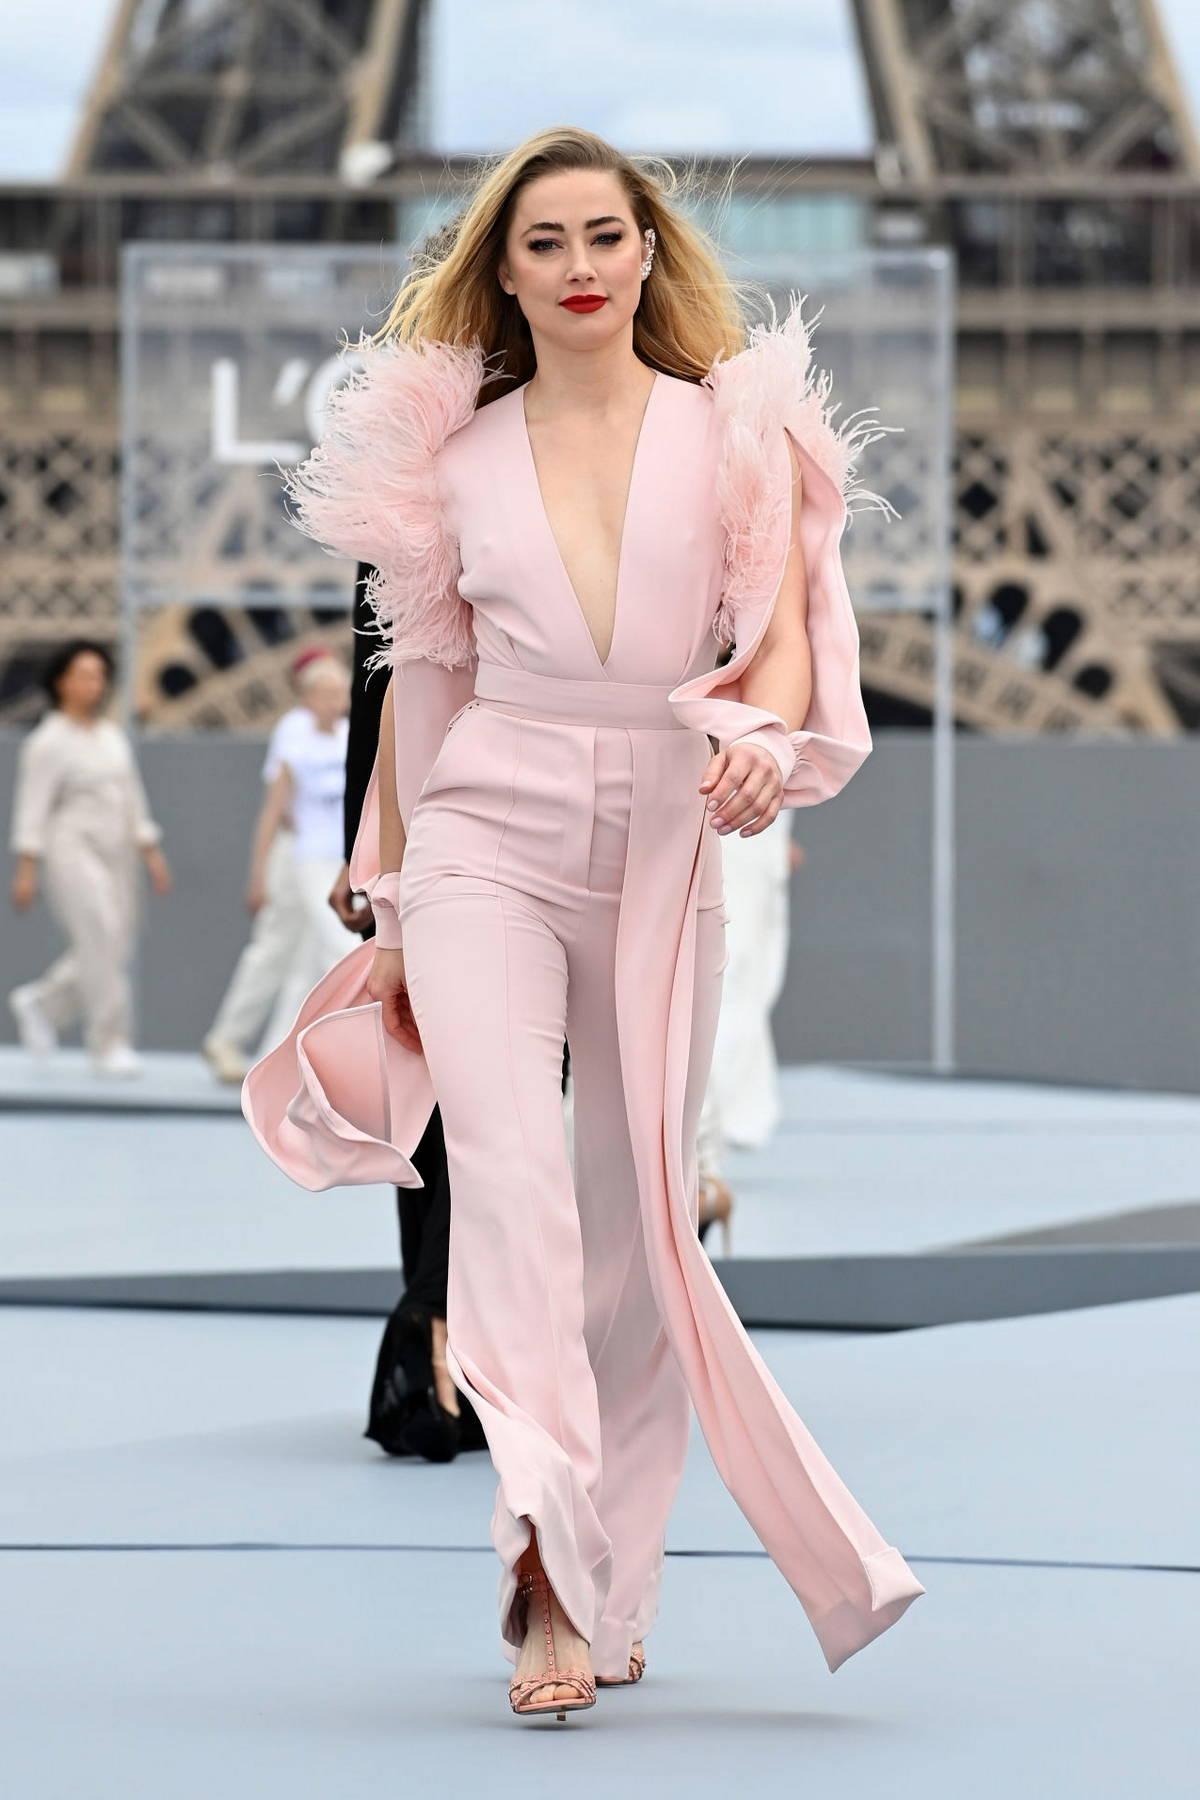 Amber Heard walks the runway for the Le Defile L'Oreal Paris 2021 Show during Paris Fashion Week in Paris, France